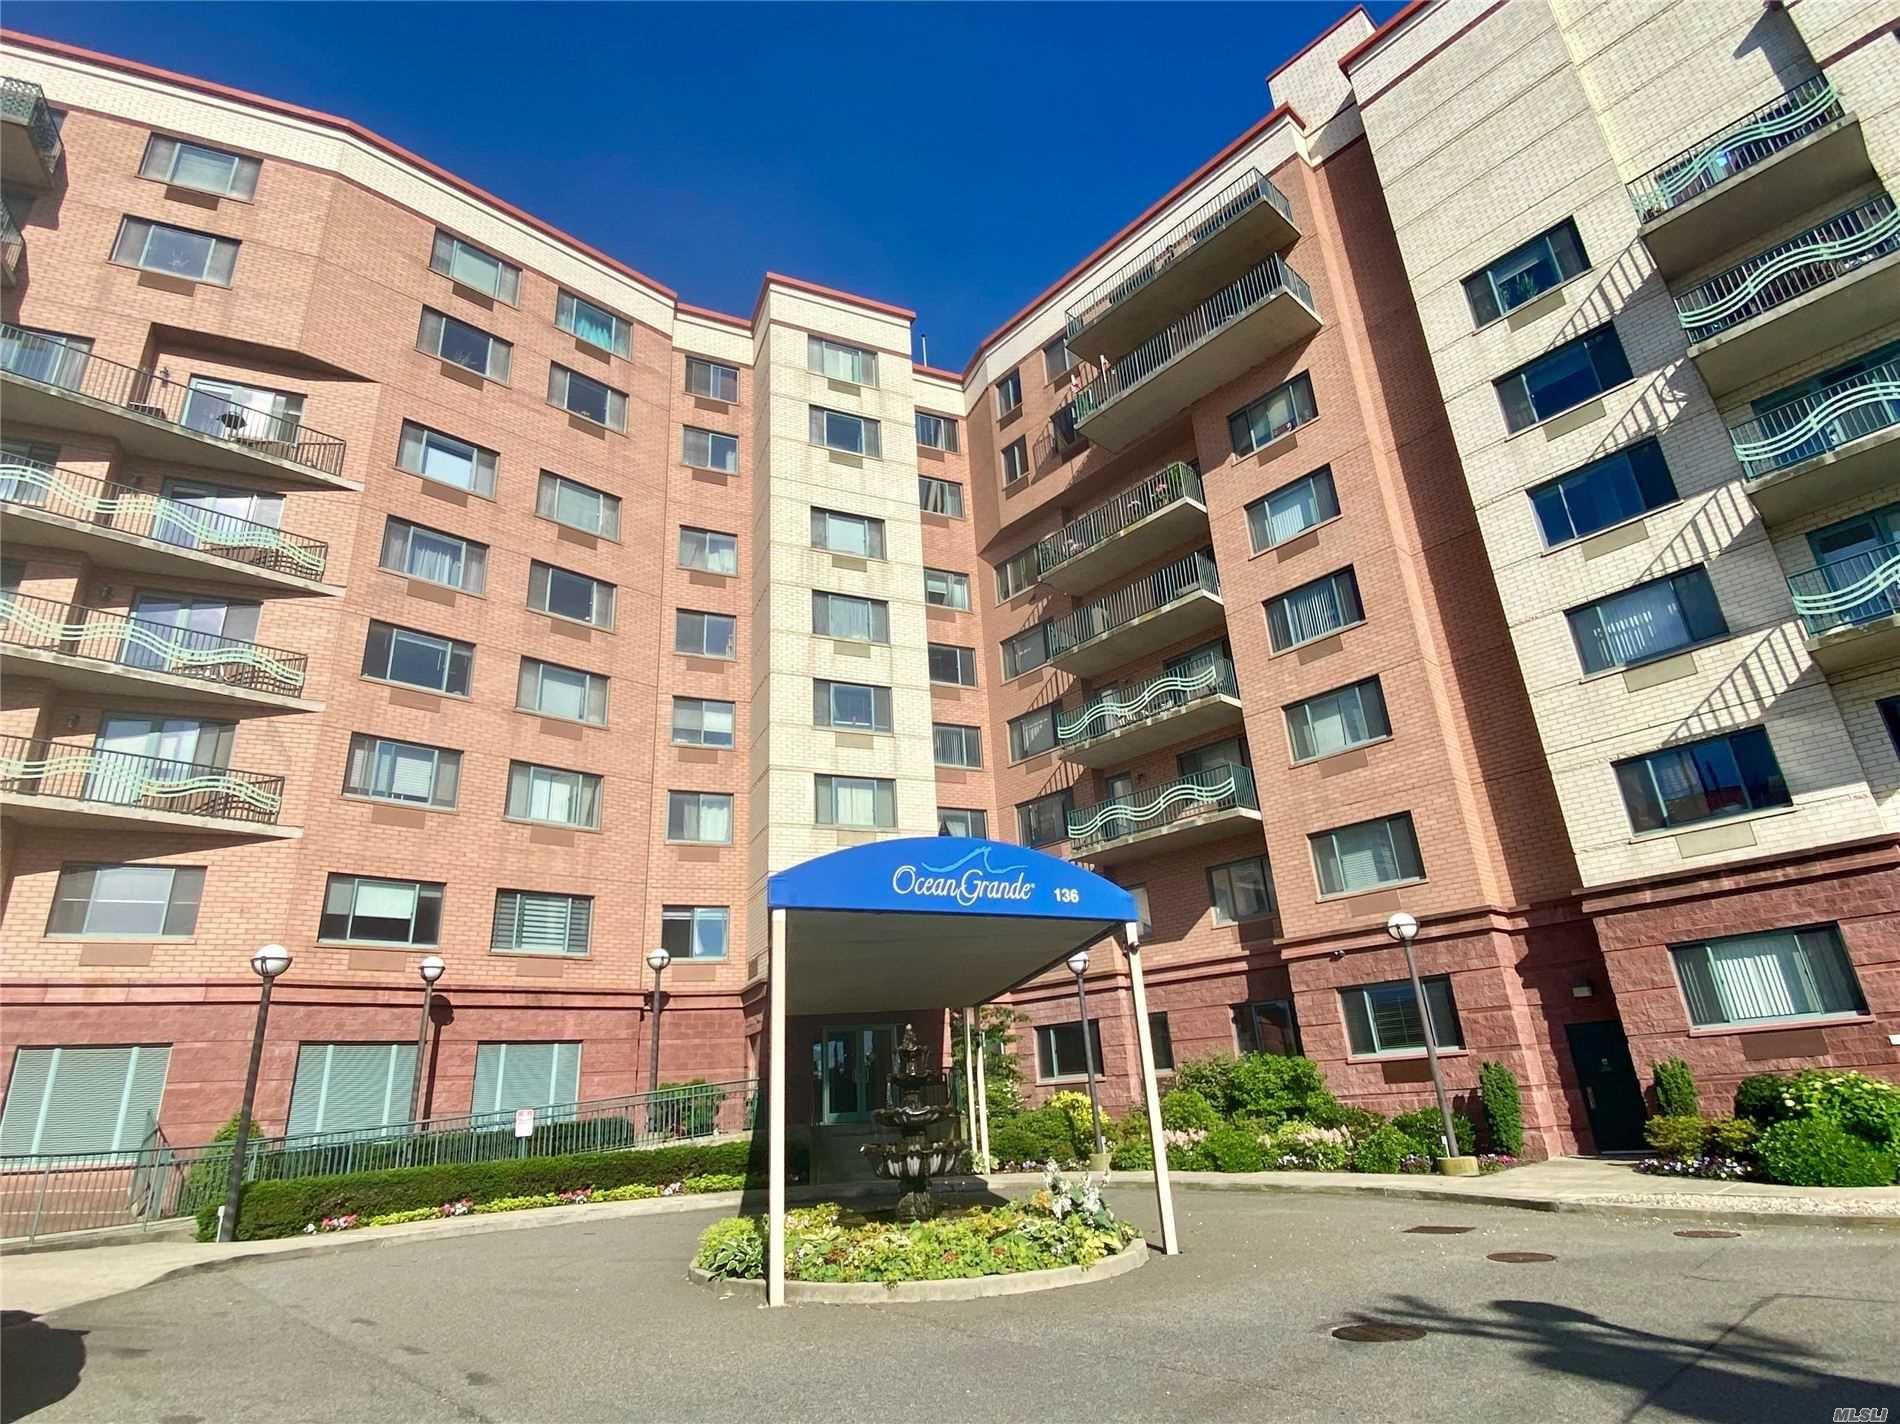 136 Beach 117 St #7A, Rockaway Park, NY 11694 - MLS#: 3223511